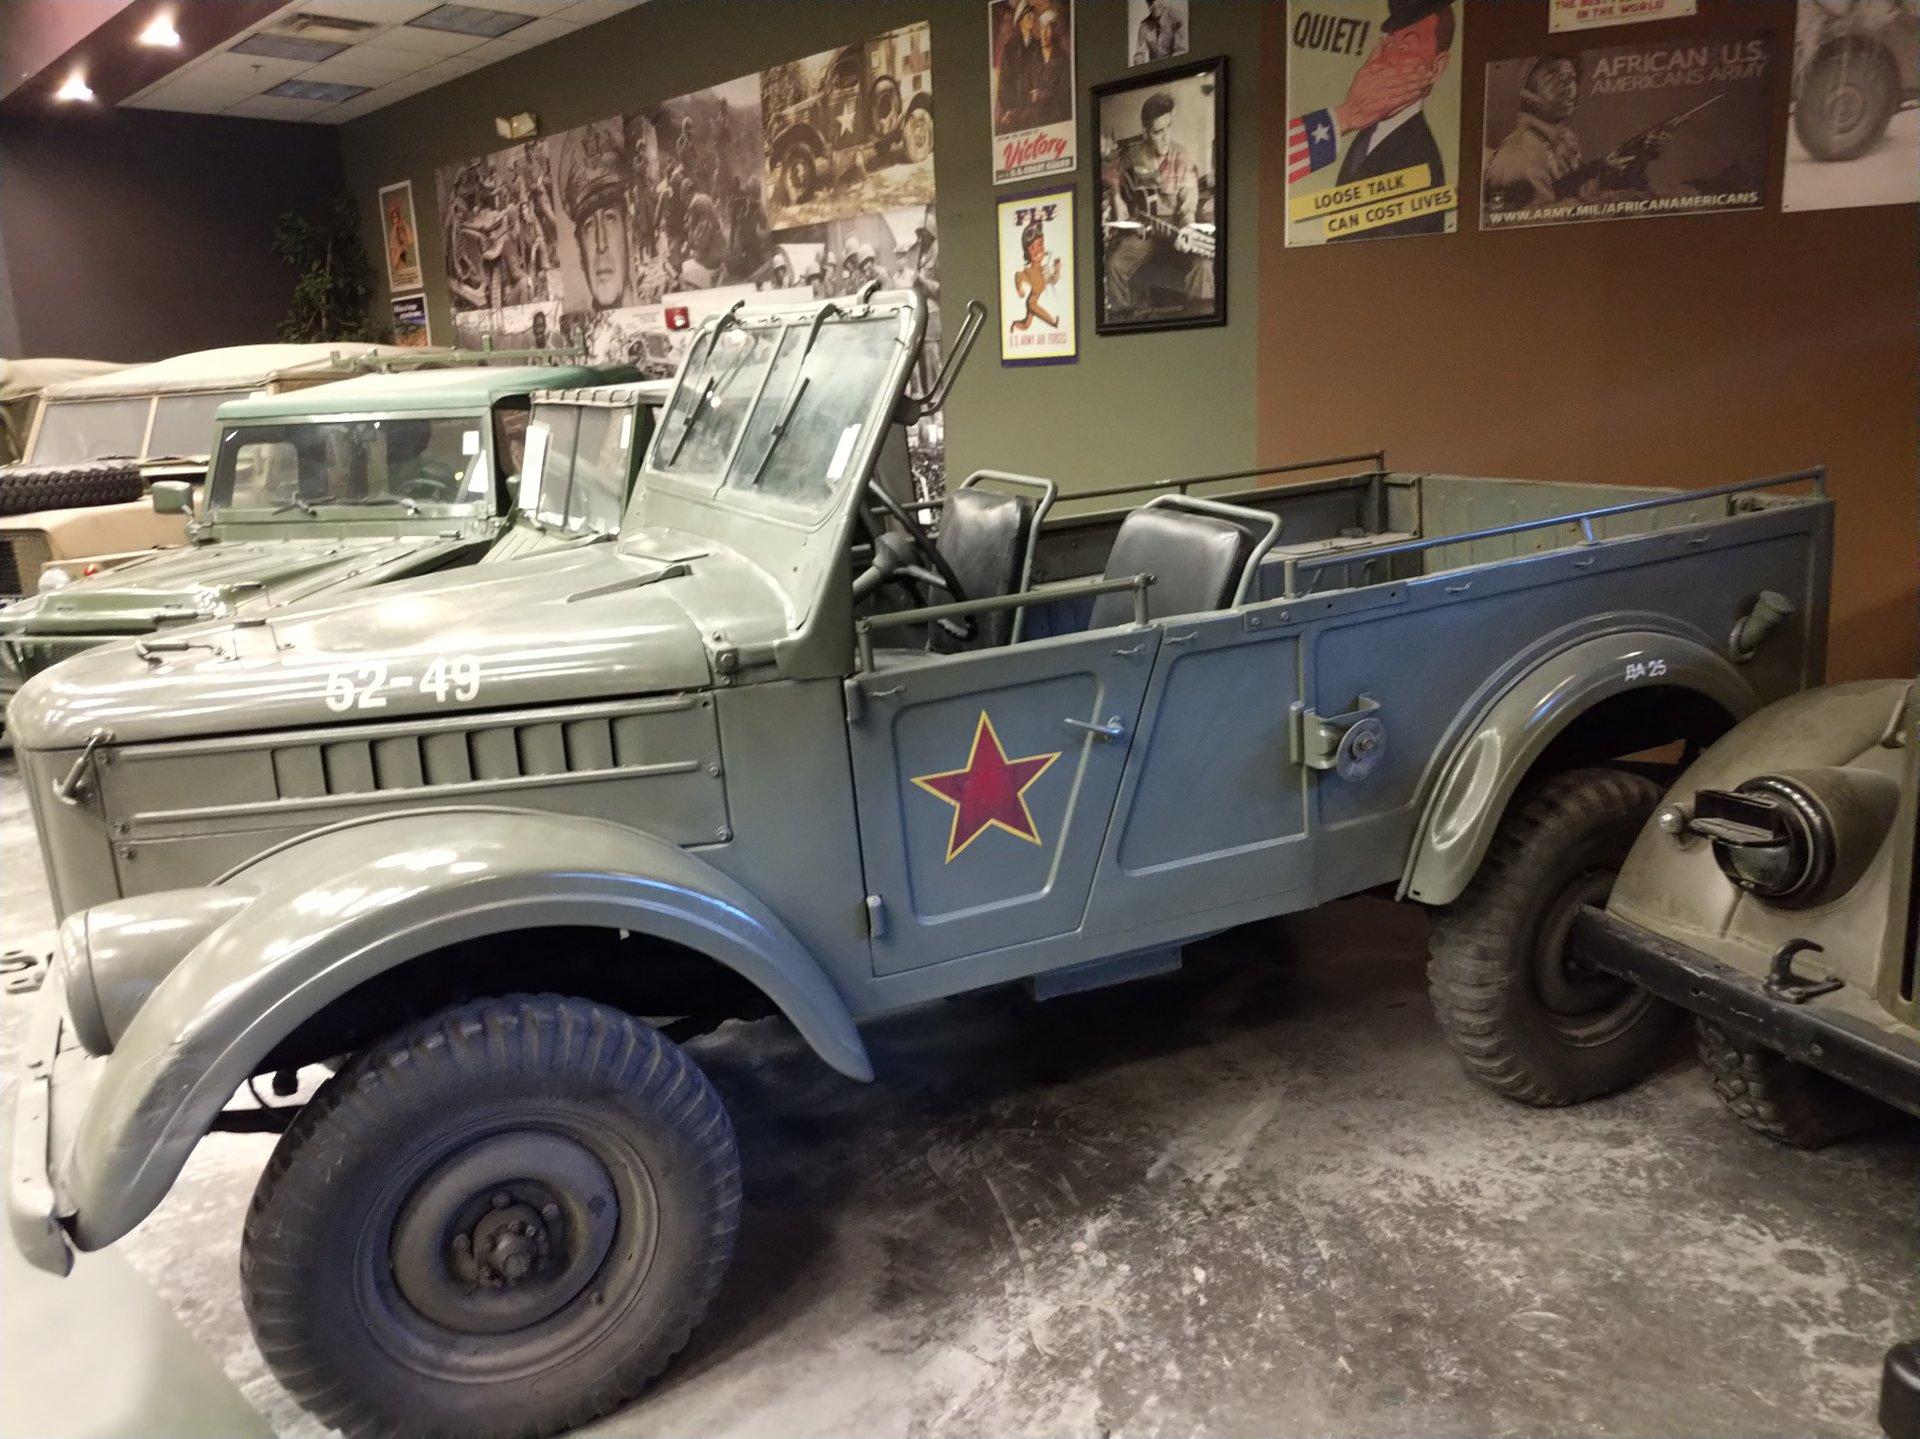 1961 GAZ Military for sale #117907 | MCG